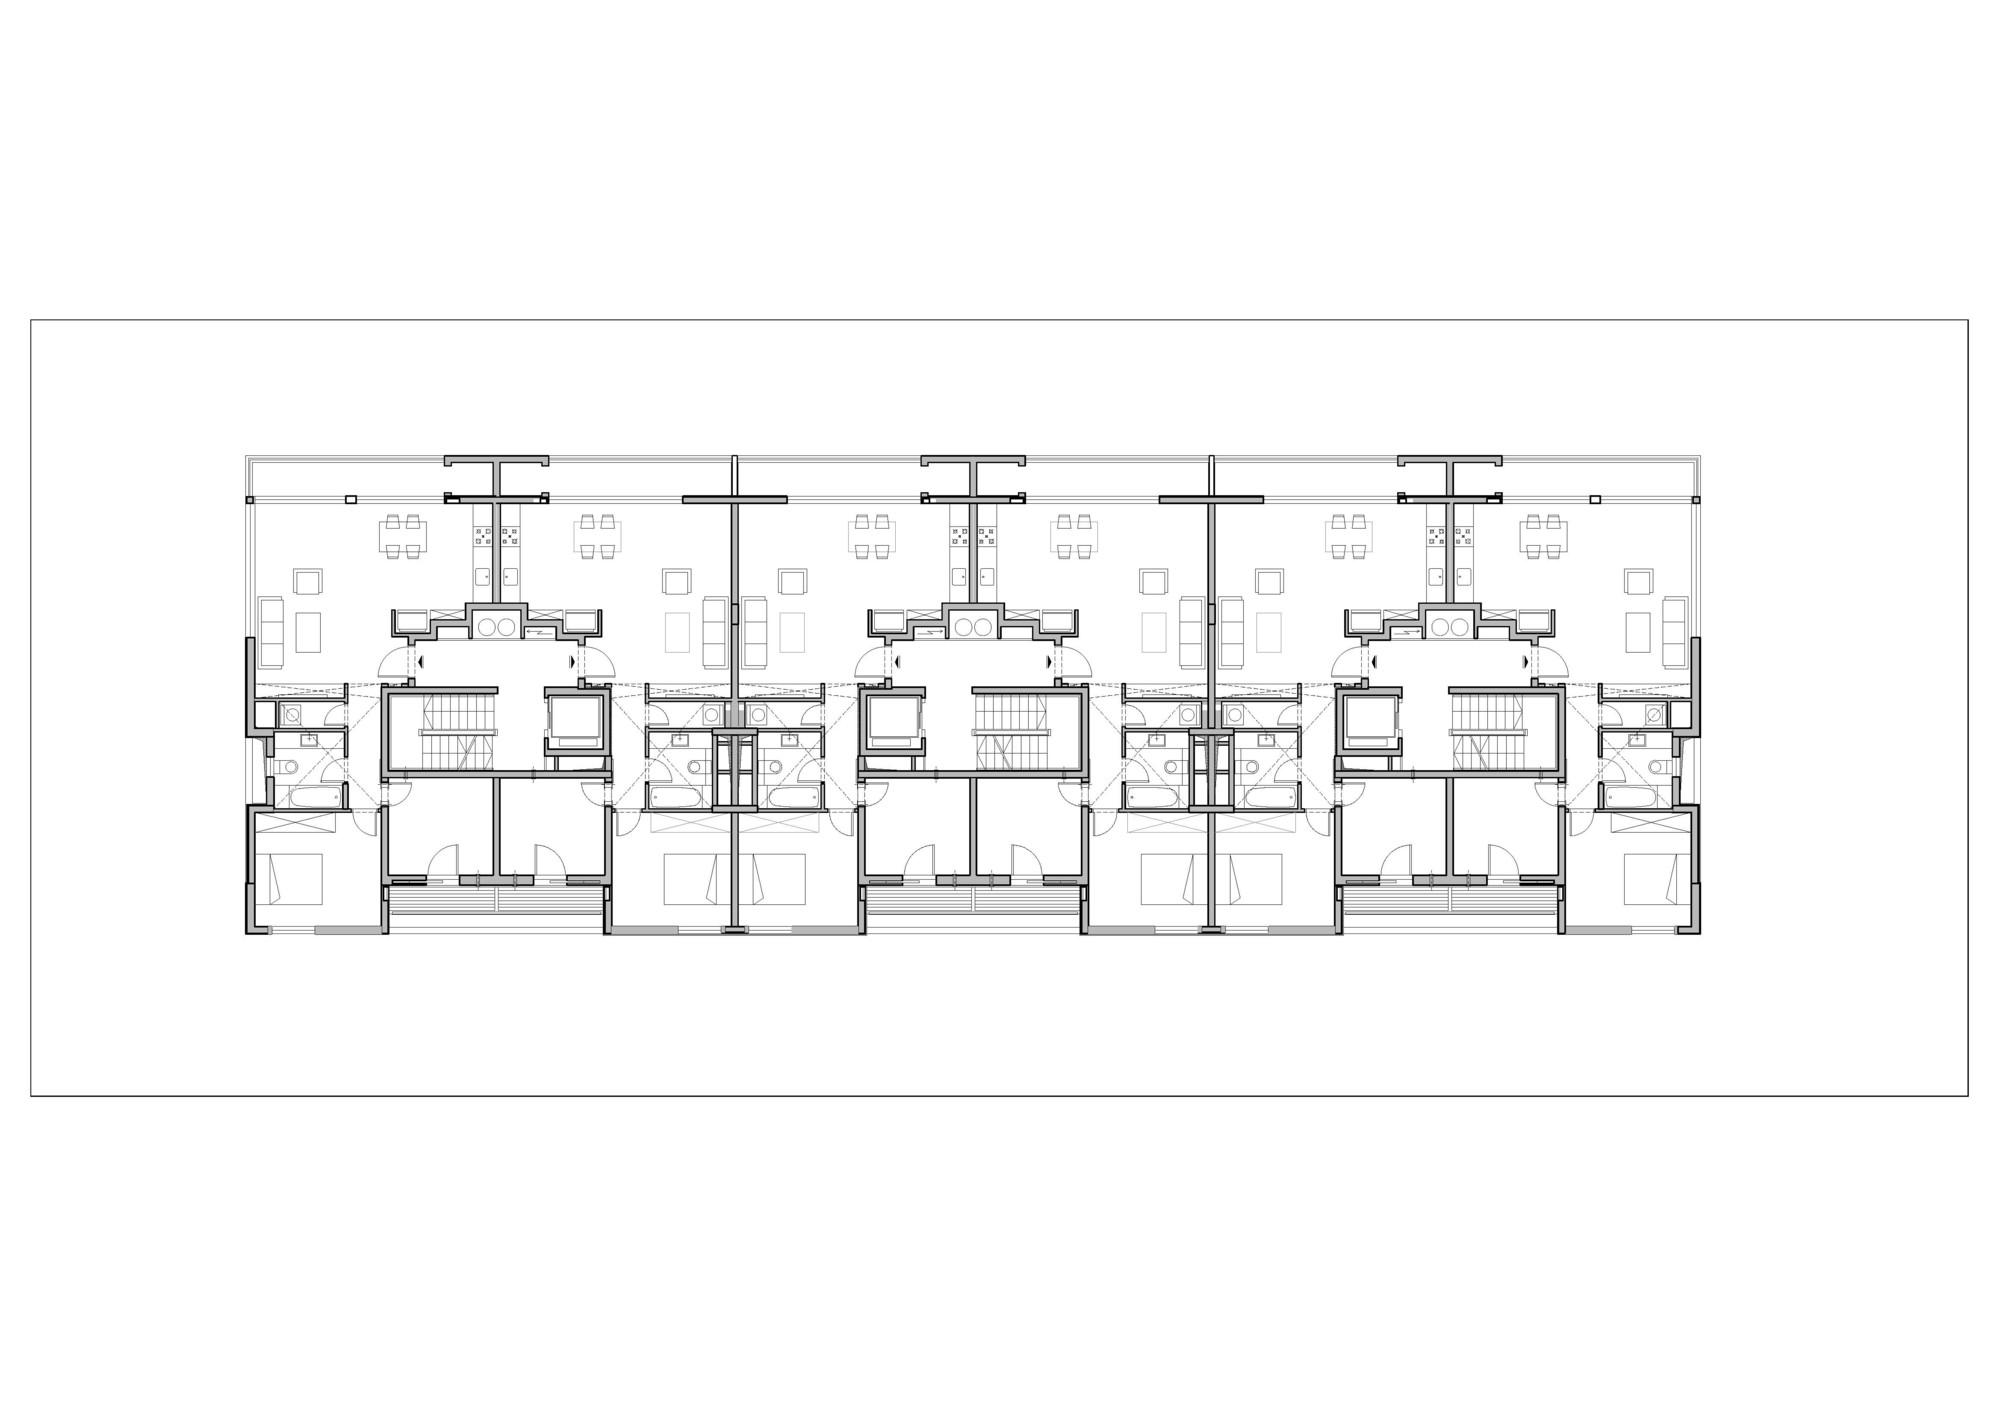 Gallery of Ganei Shapira Affordable Housing / Orit Muhlbauer Eyal ...